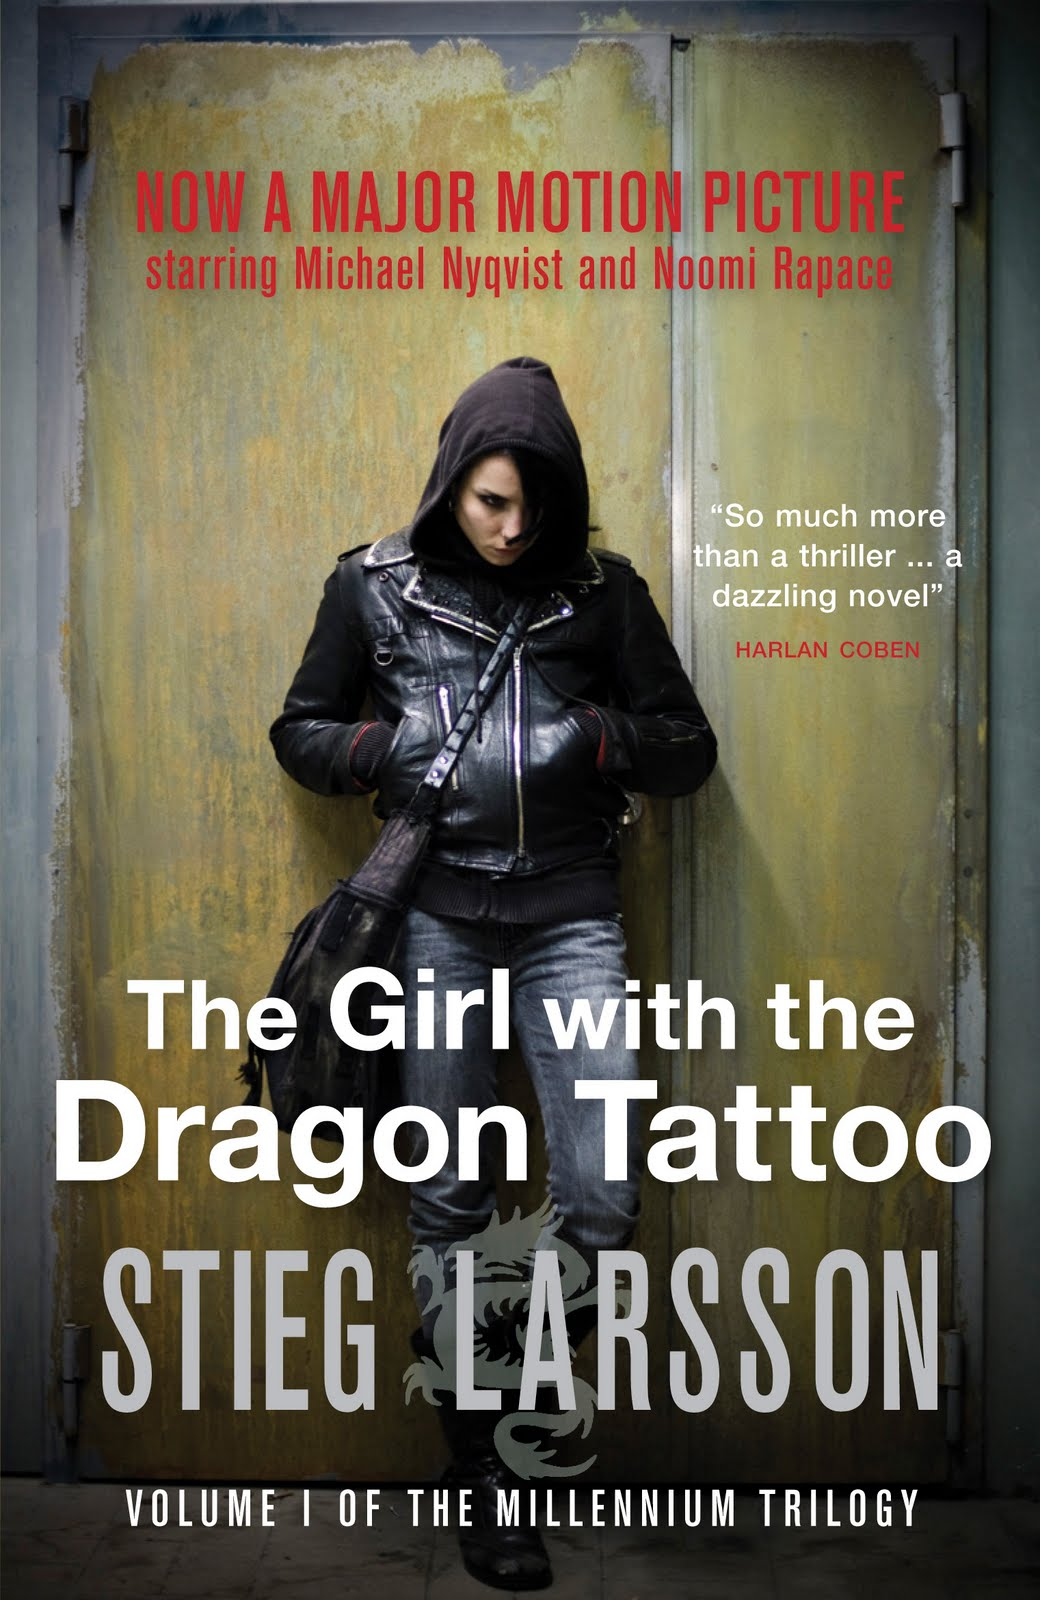 http://3.bp.blogspot.com/_ZiYcB57vk5I/TM7MkZxFYwI/AAAAAAAAA1E/Rhs_FMvfo3g/s1600/The+Girl+with+the+Dragon+Tattoo.jpg